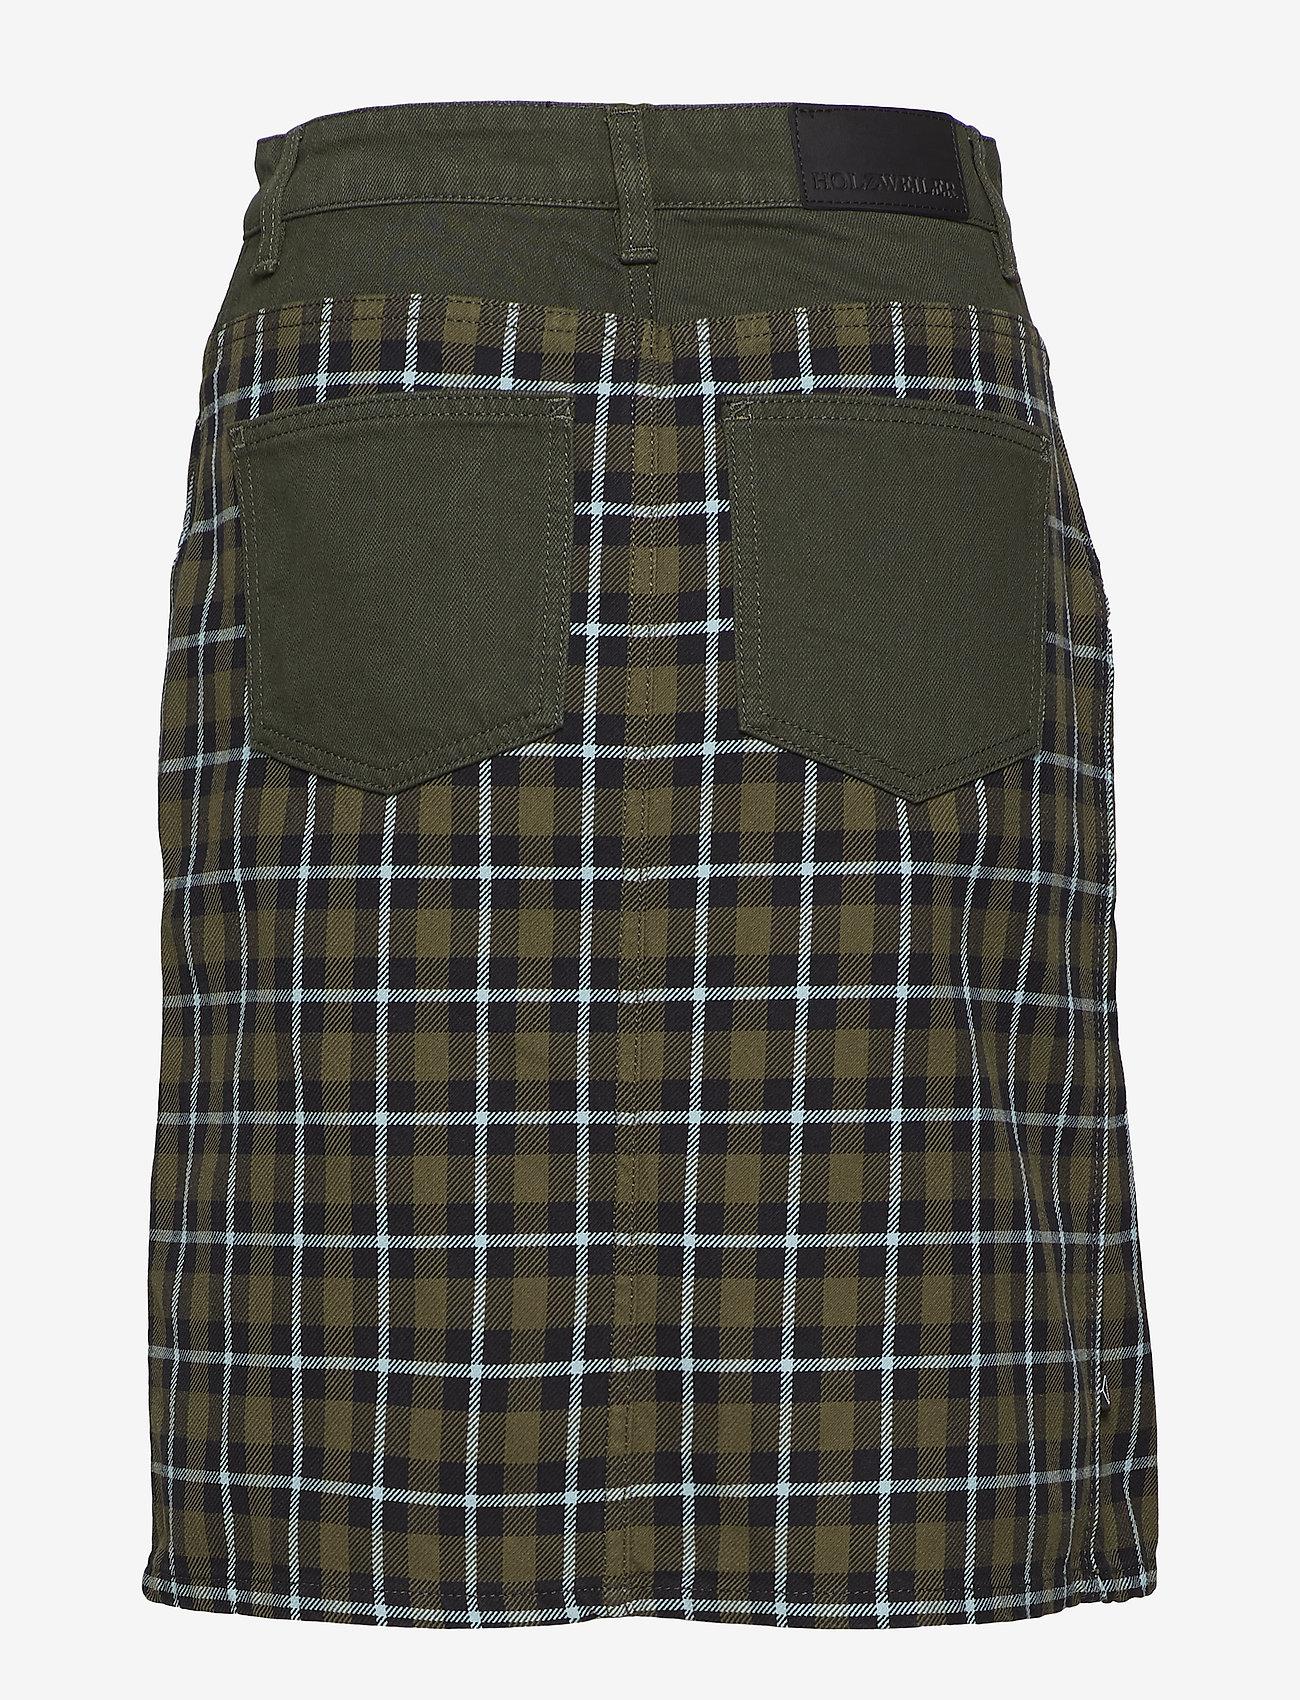 HOLZWEILER BRIDGET Skirt AW18 - Spódnice ARMY CHECK - Kobiety Odzież.